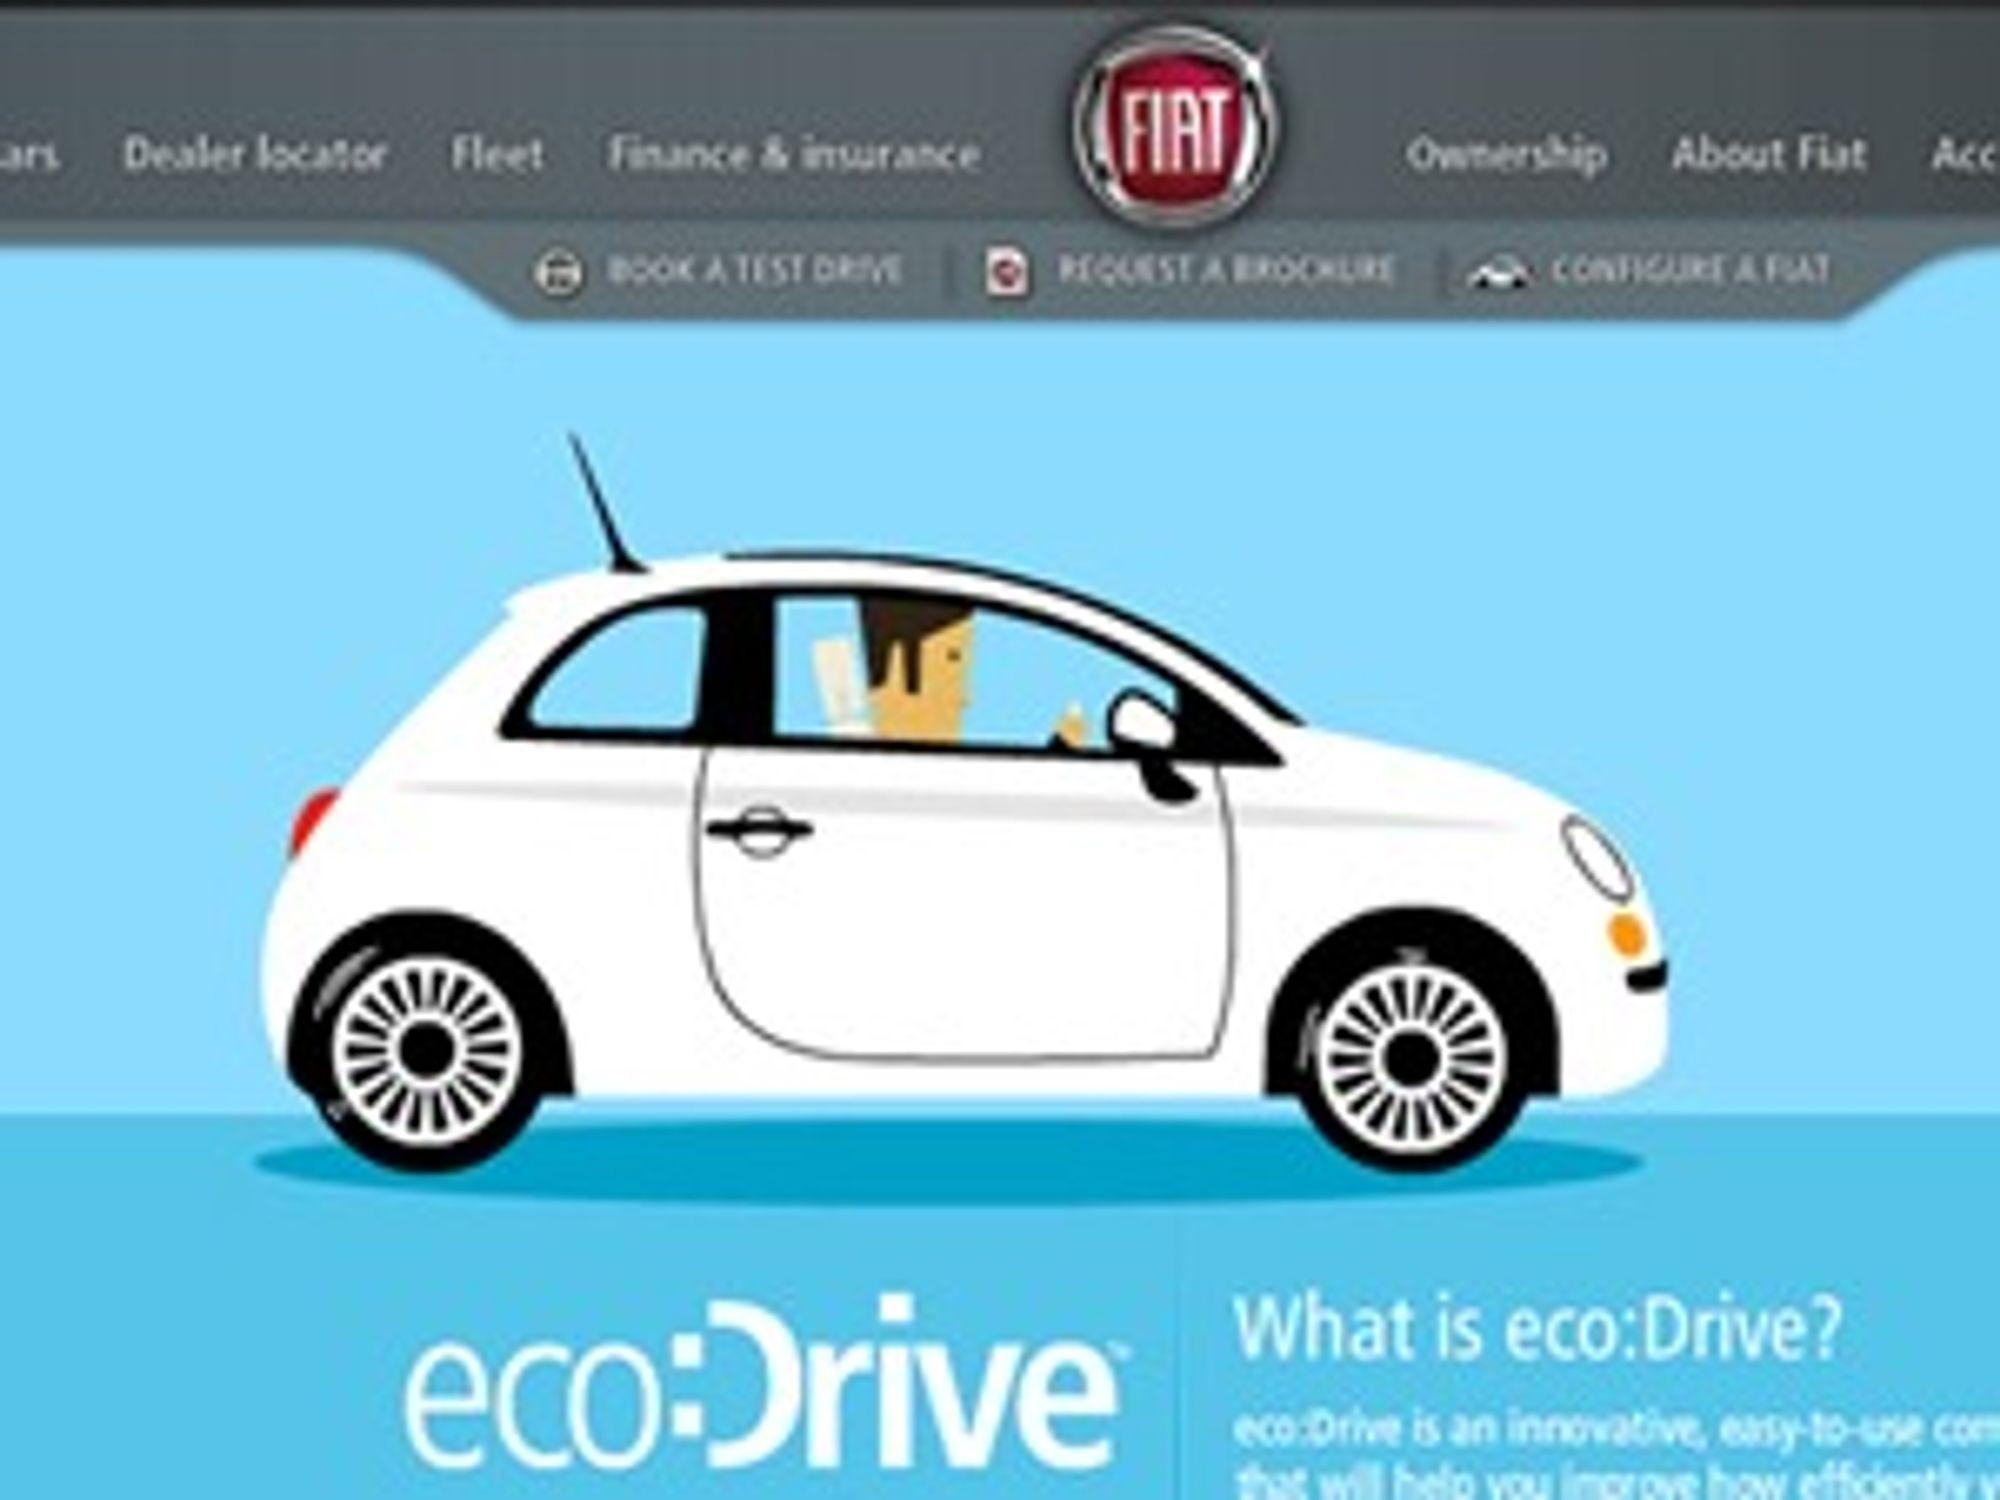 Fiat ecodrive er et eksempel på framtidsrettet nettsted, ifølge Kenny Bogø i Adobe.